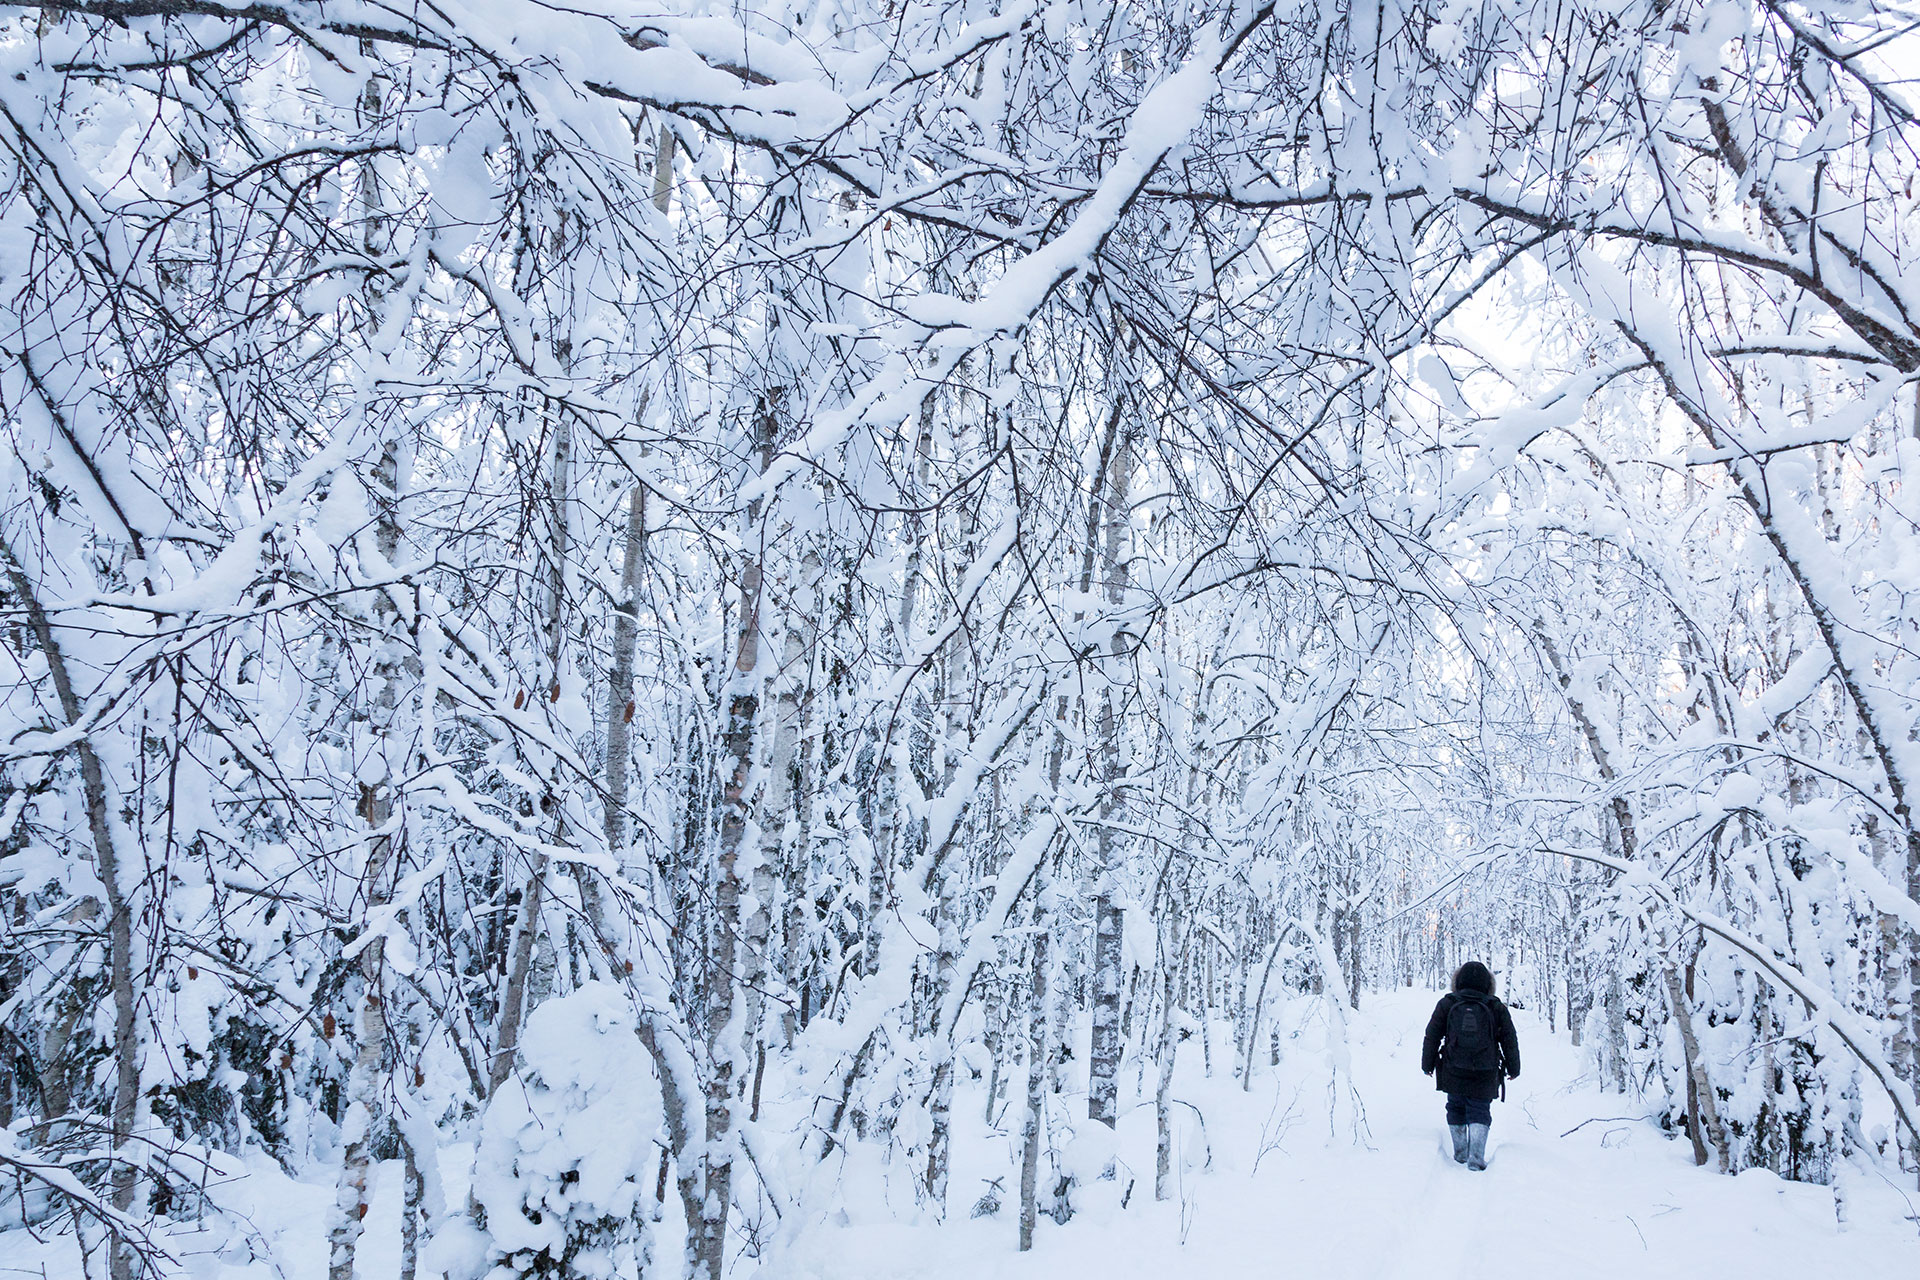 visit-rovaniemi-love-snow-and-ice-web-opt-5.jpg